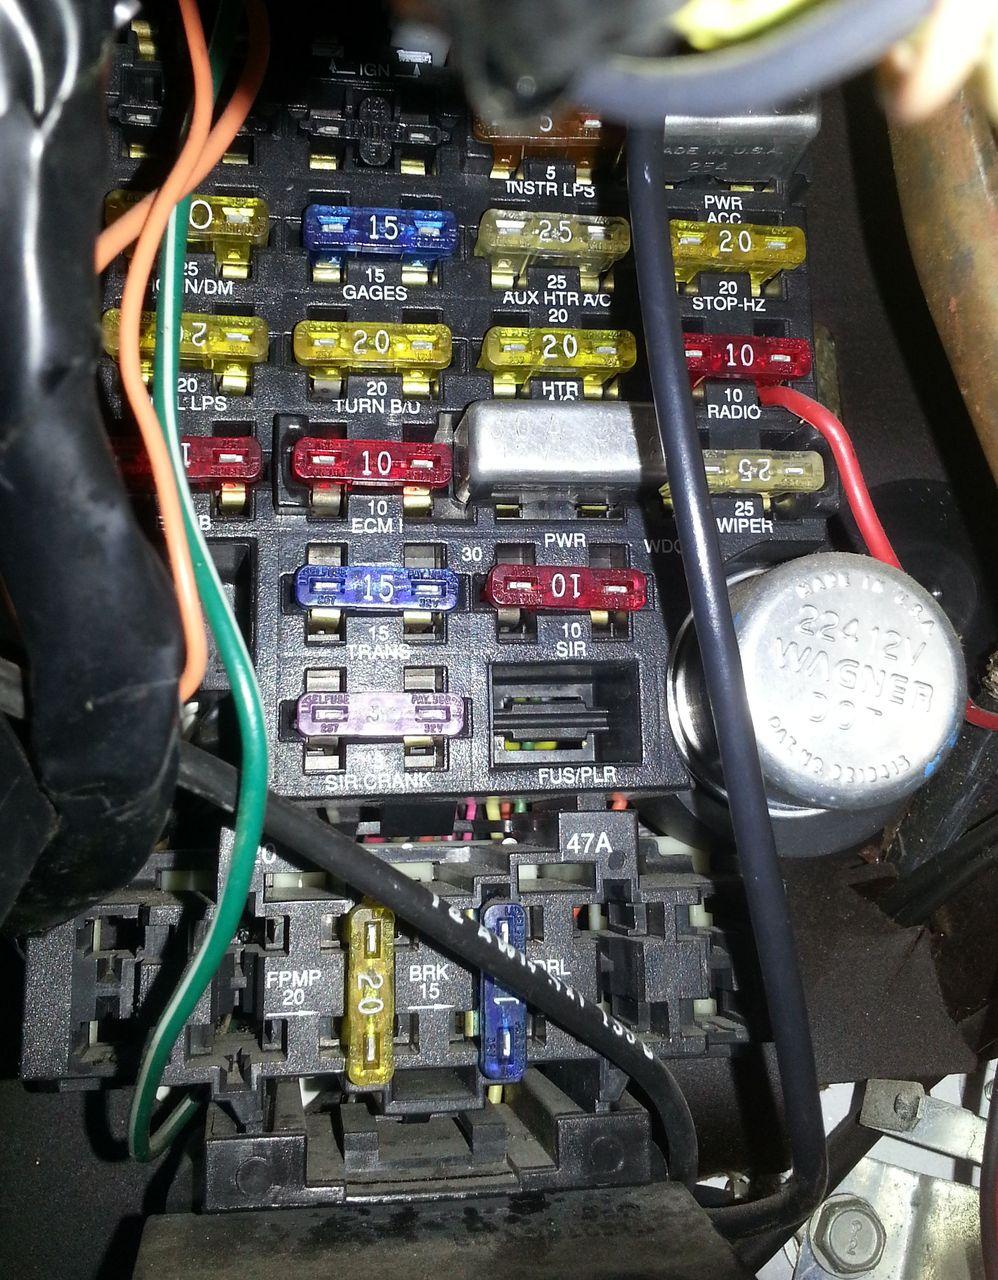 gm fuse box van schematic diagram data89 gm fuse box wiring diagram gp 89 chevy fuse box wiring diagram 89 chevy fuse